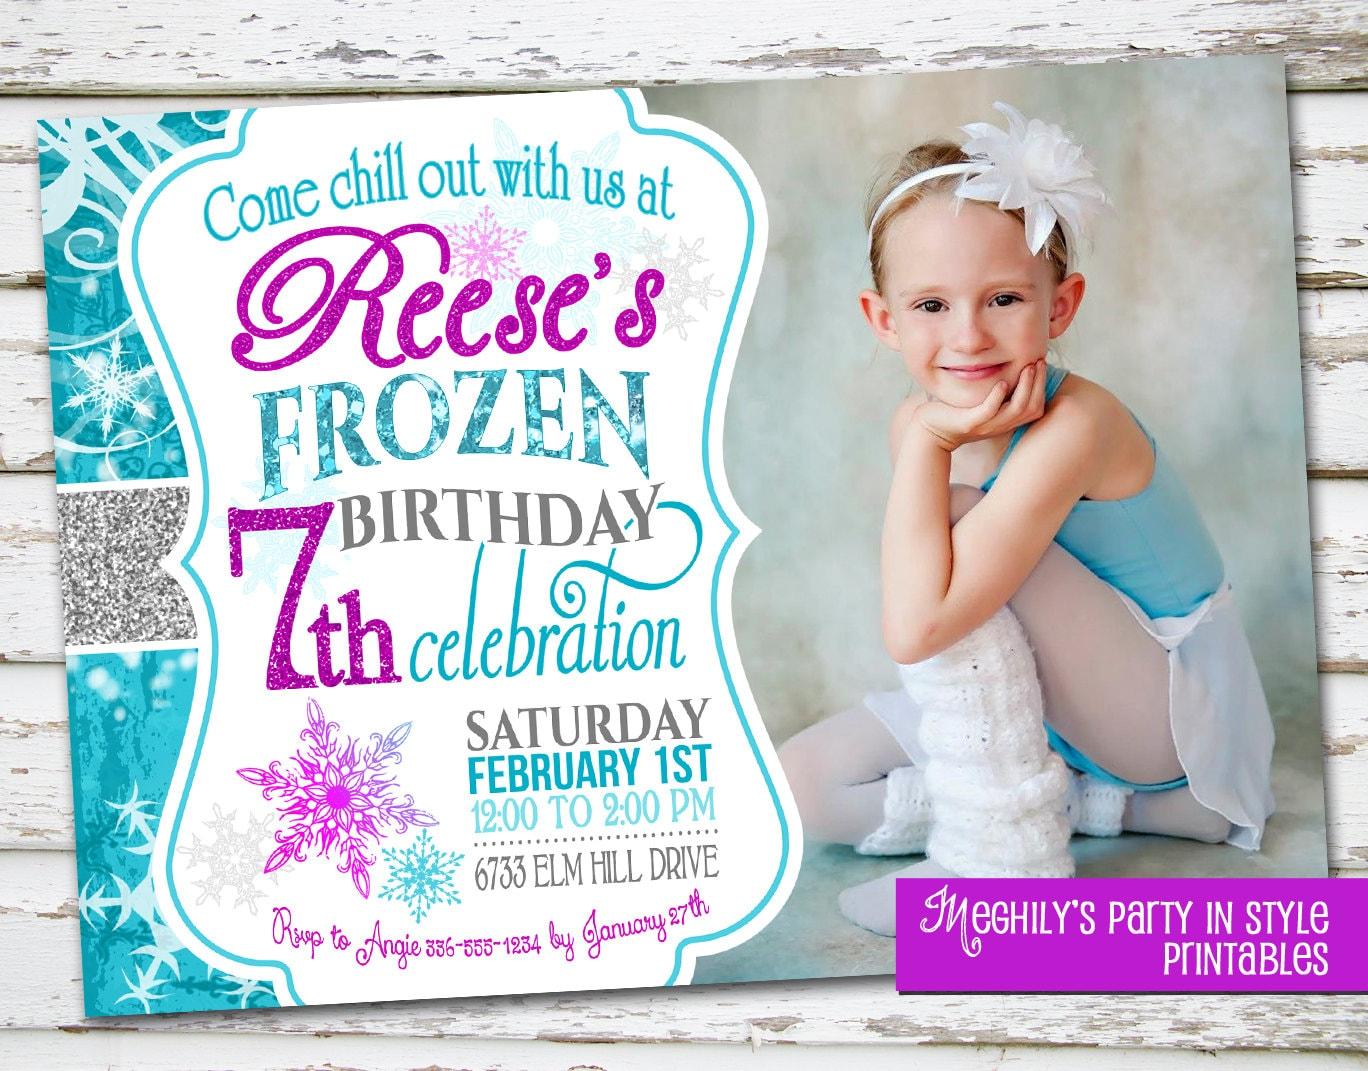 Frozen Birthday Invitation With Photo - Frozen birthday party invitation template free